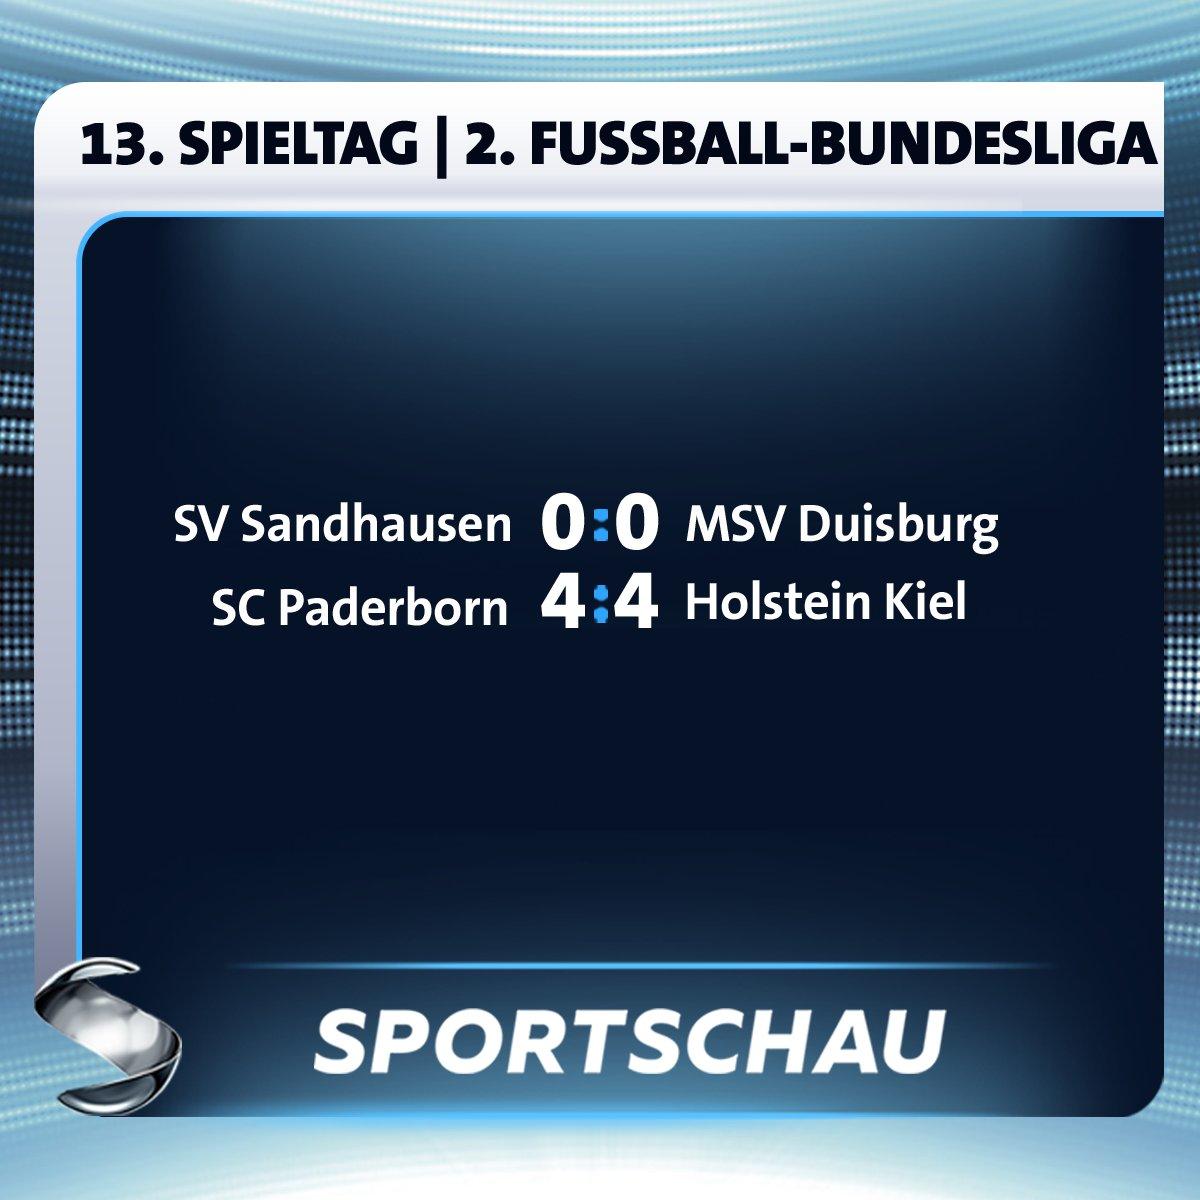 RT @sportschau: Okay, @SCPaderborn07 und @Holstein_Kiel. Das war mal unterhaltsam. 👏 #SVSMSV #SCPKSV https://t.co/ym5YrY3TCd